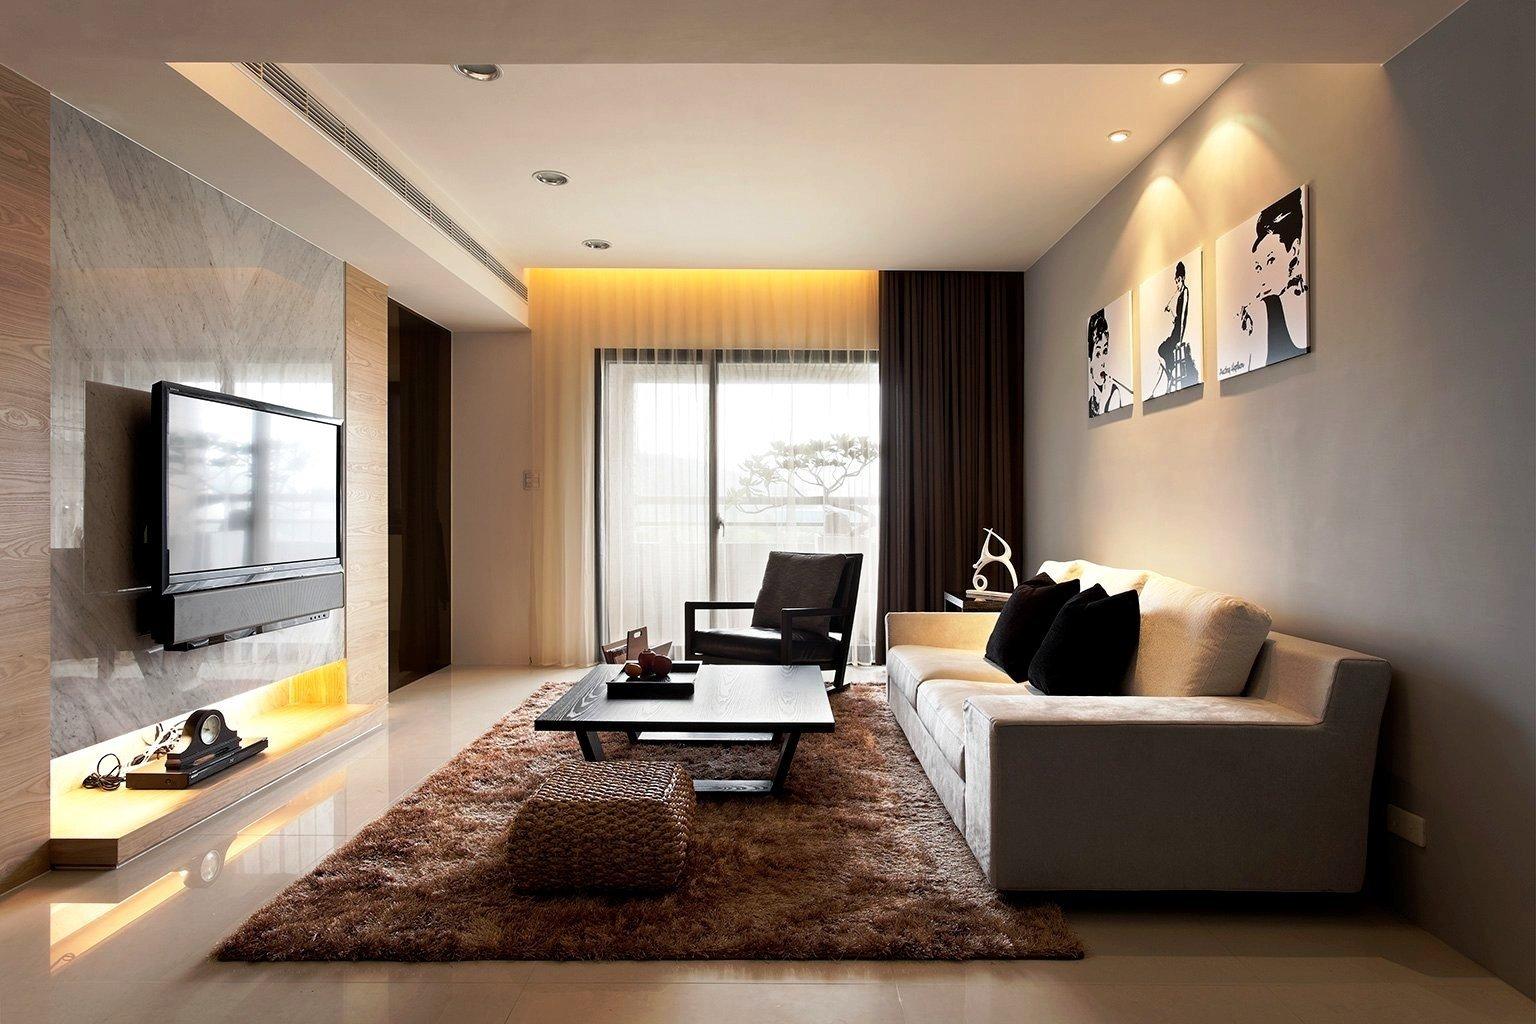 10 Ideal Living Room Ideas For Apartments apartment living room decor fair design ideas adorable apartment